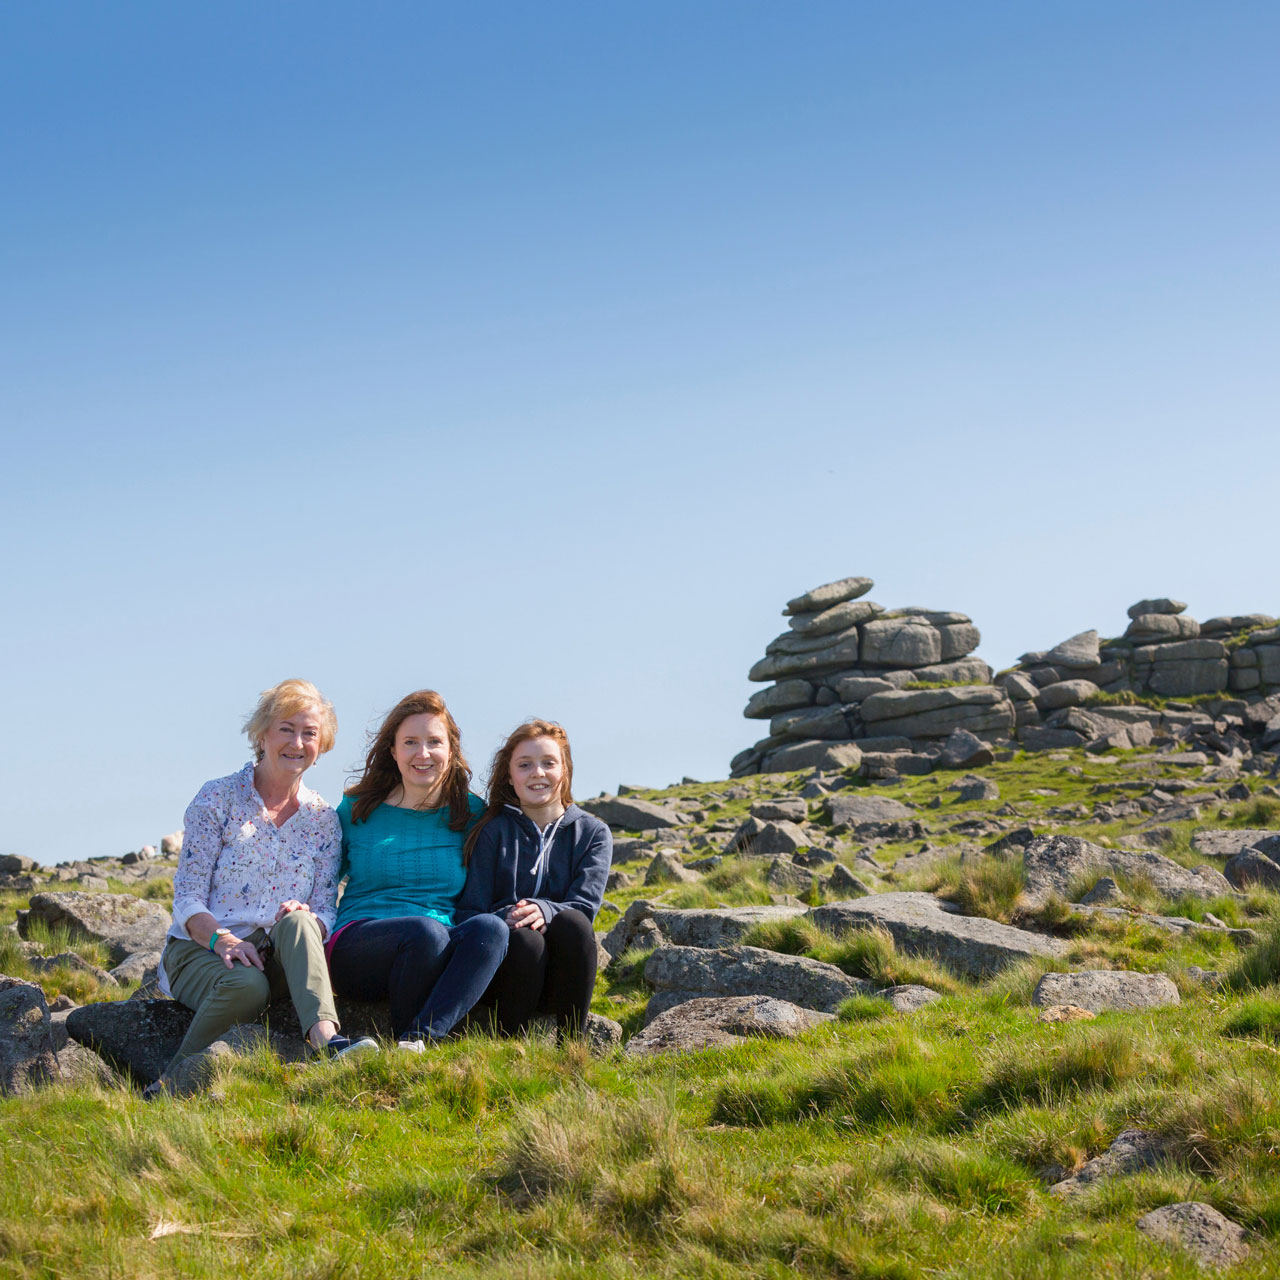 3 generations of one Dartmoor family